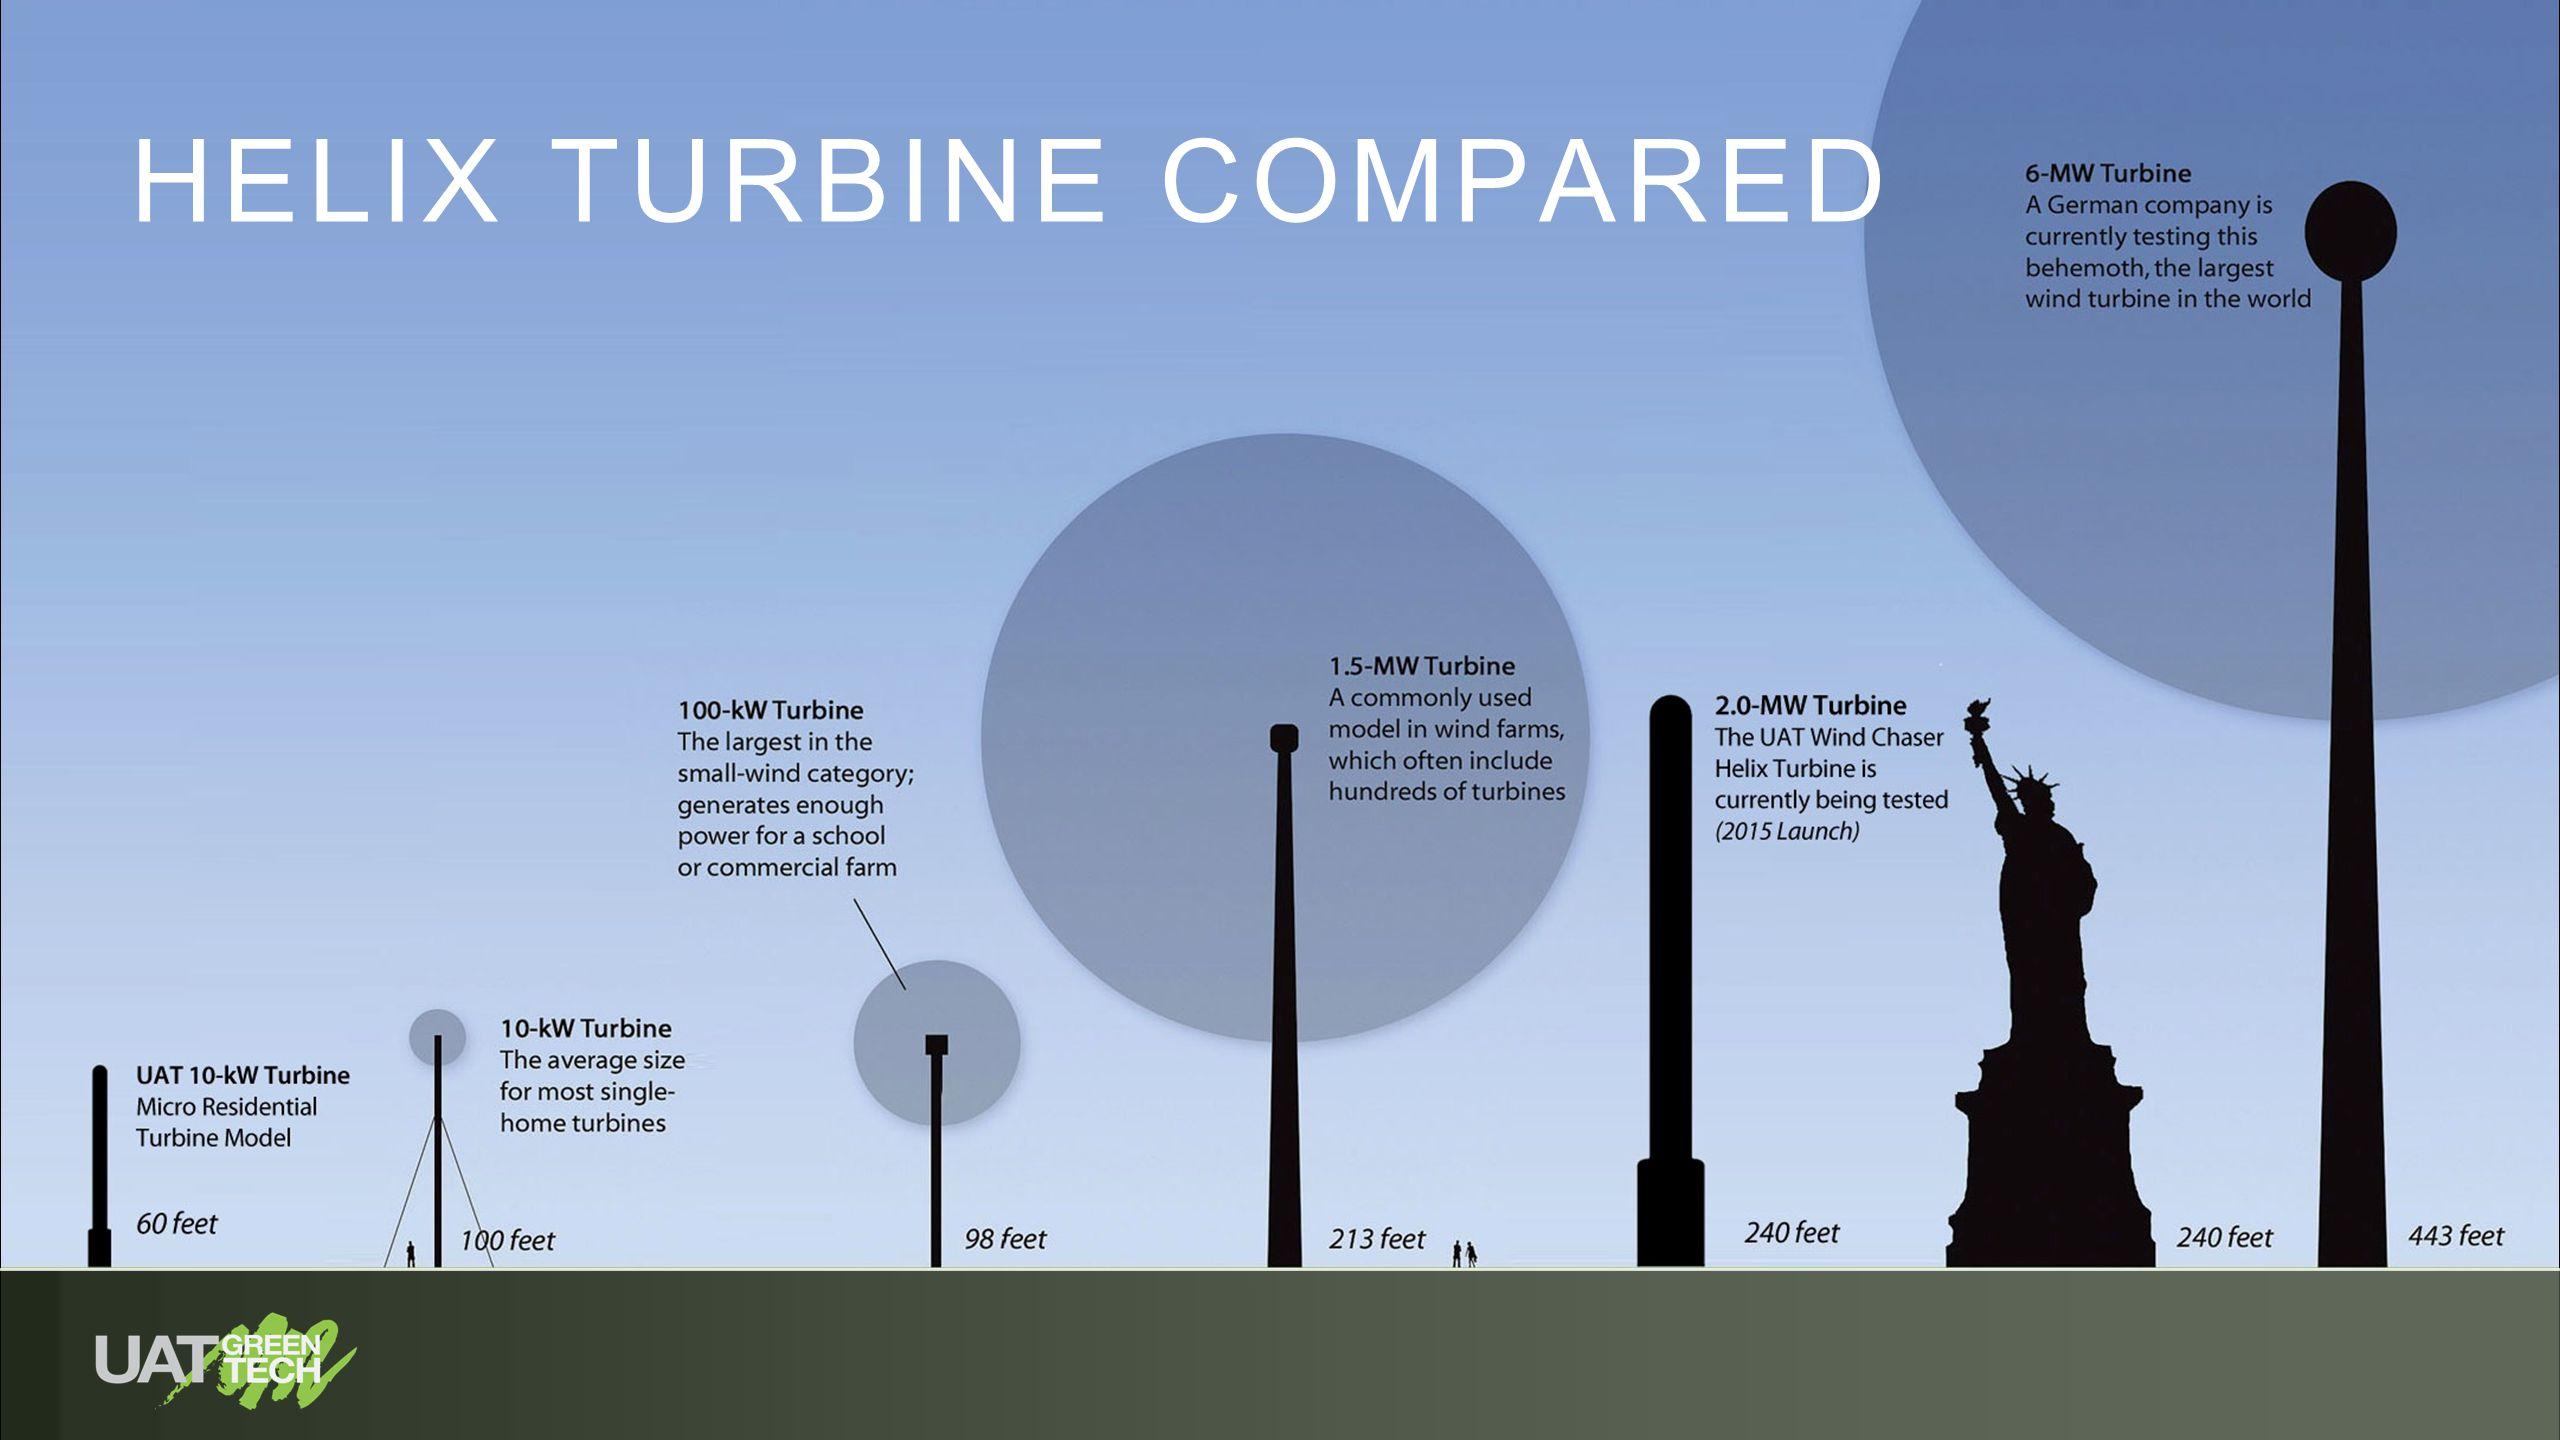 Helix Turbine patent pending - zero gravity drive train sustainable